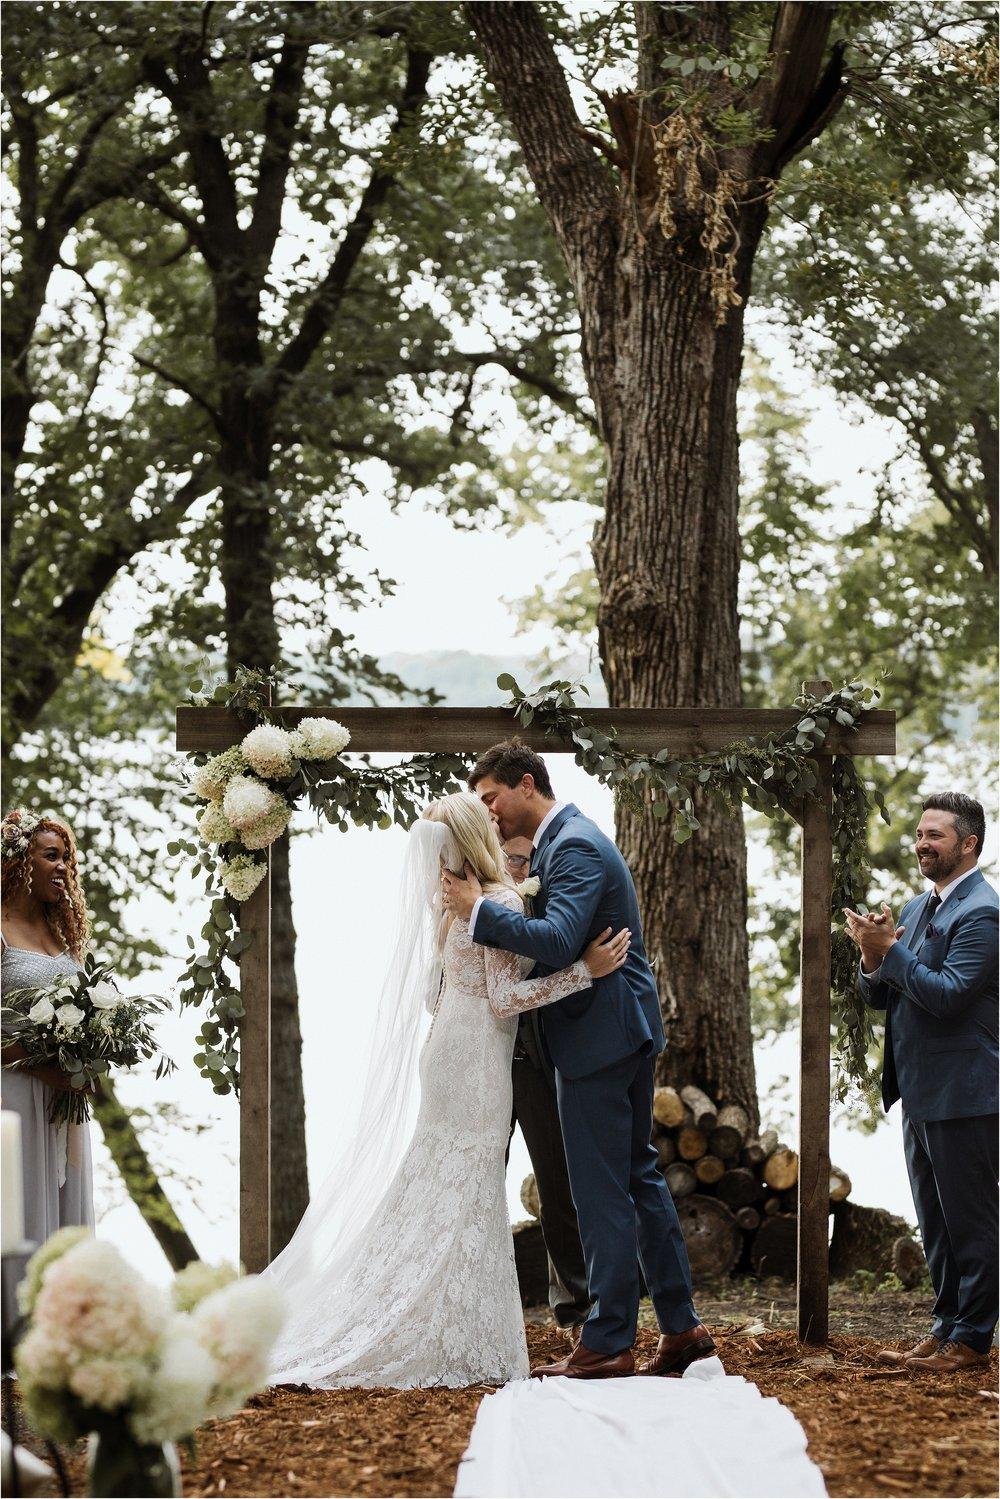 backyard-minneapolis-willmar-minnesota-wedding-photography_0032.jpg